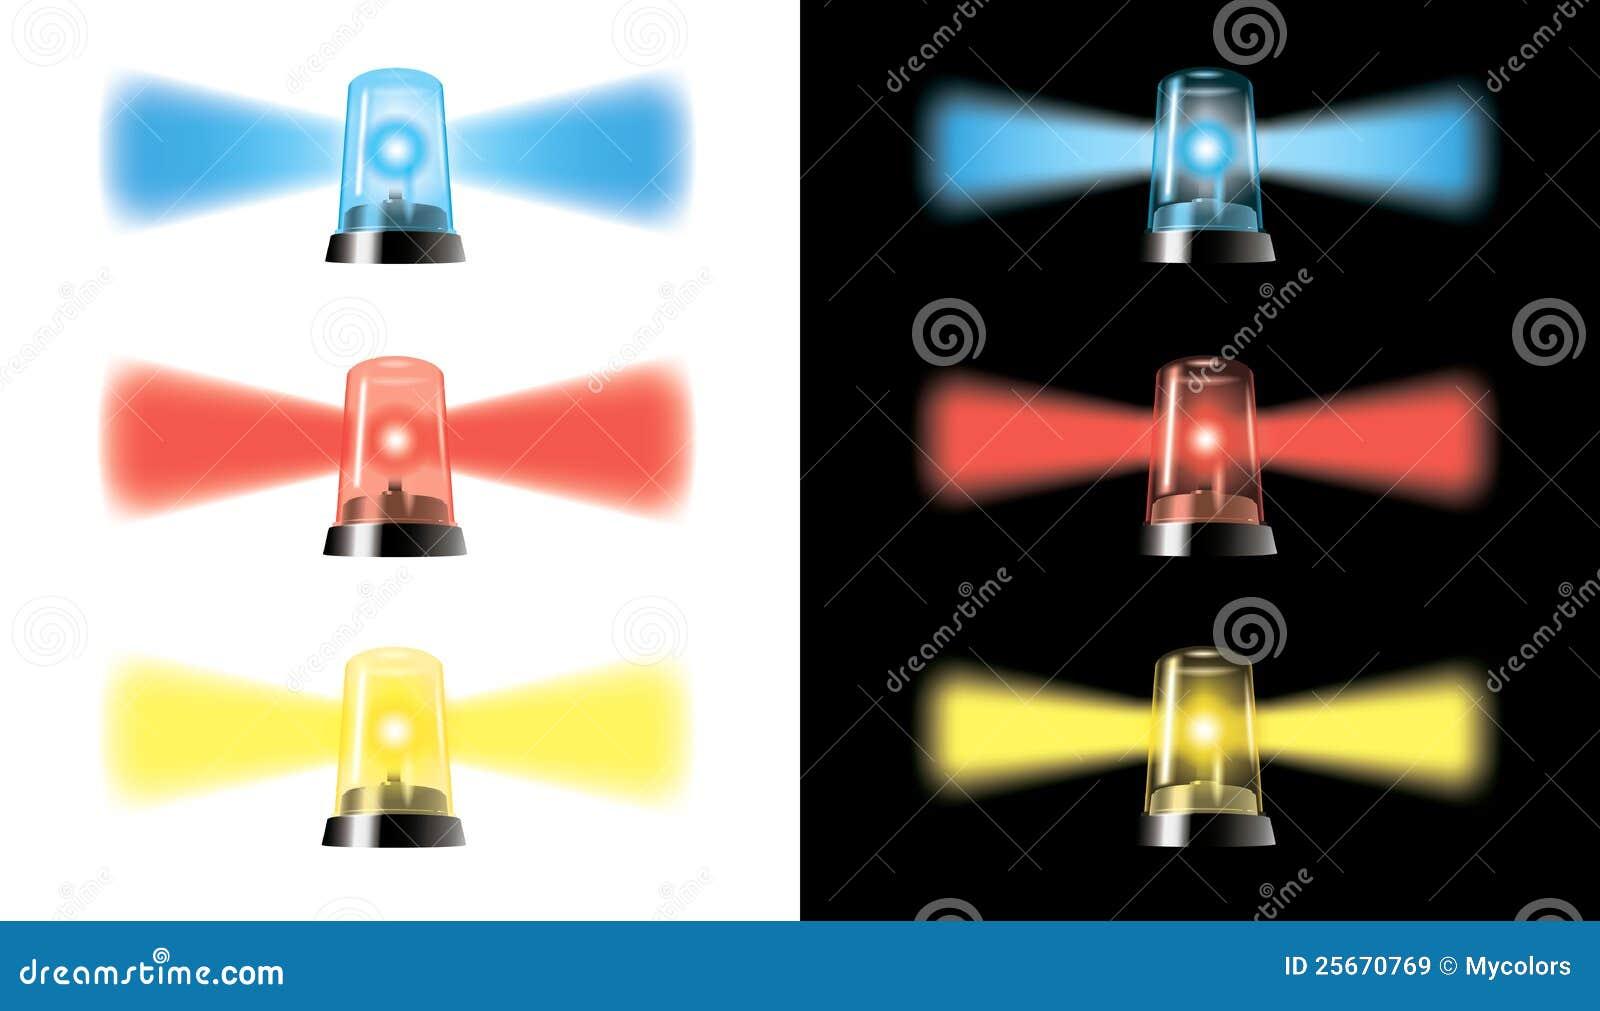 Visual Warning Lights - Special Cars Signal - Eps Stock